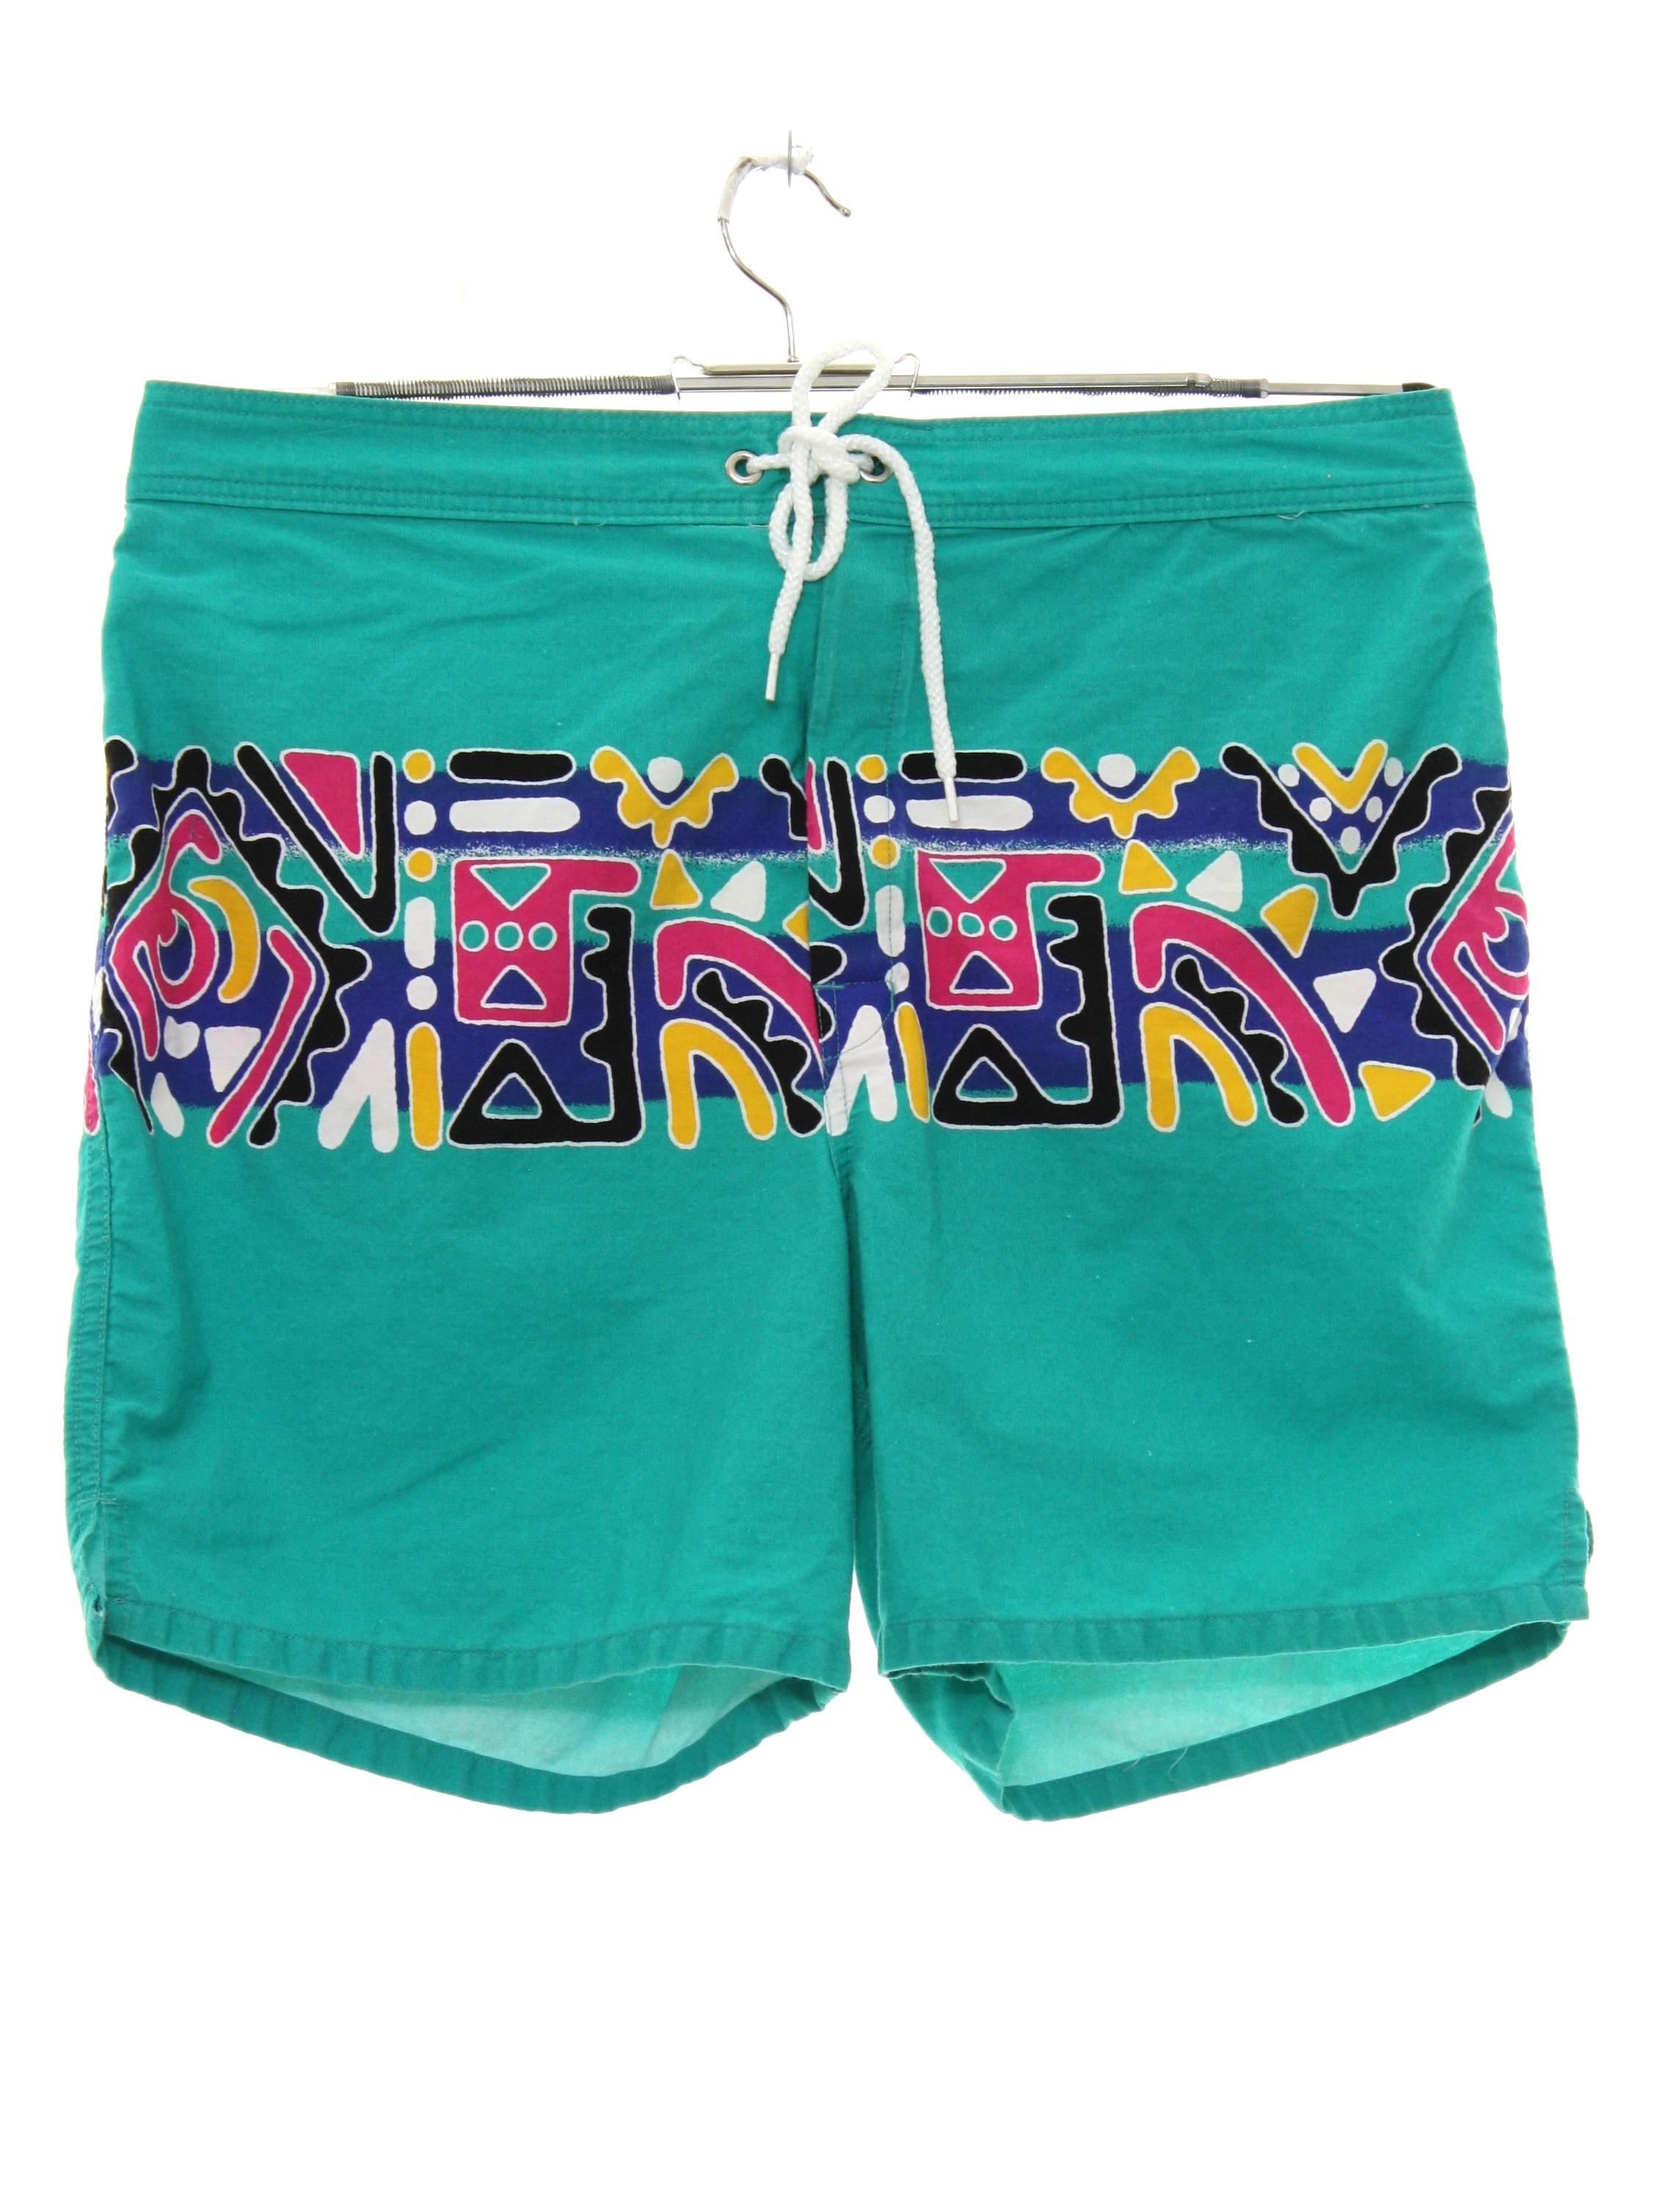 2337430c46 Retro Eighties Swimsuit/Swimwear: 80s -Hobie- Mens mint green ...